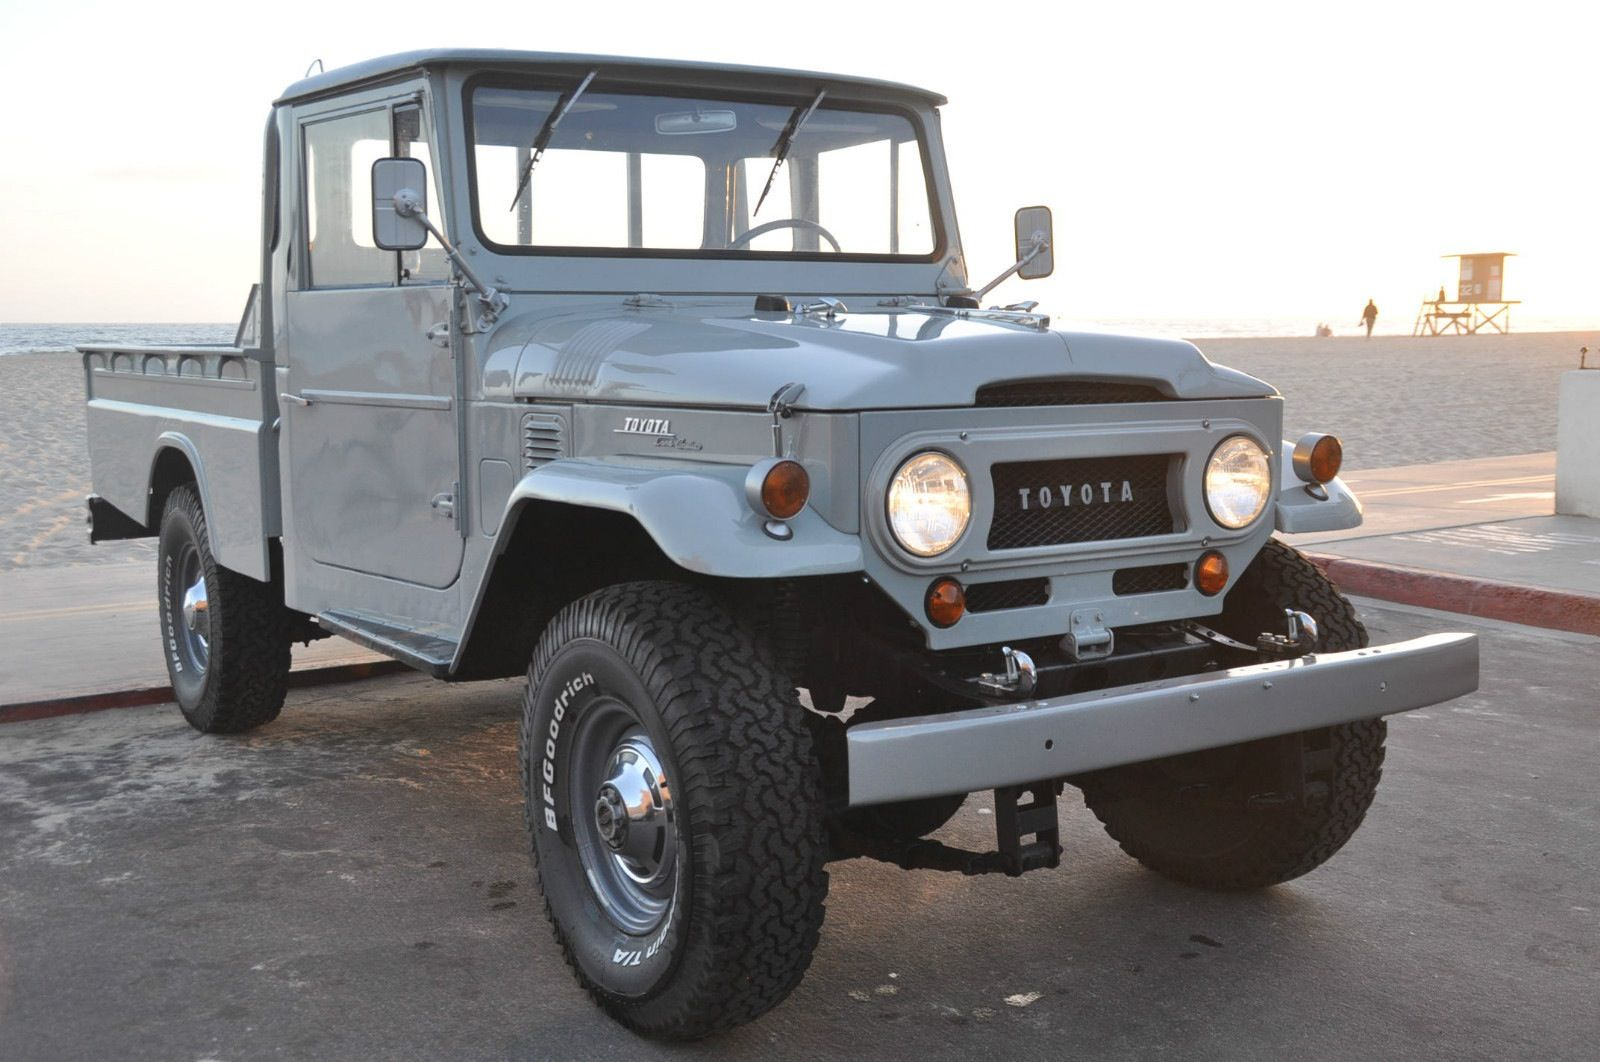 1966 toyota land cruiser fj45 truck japan restored